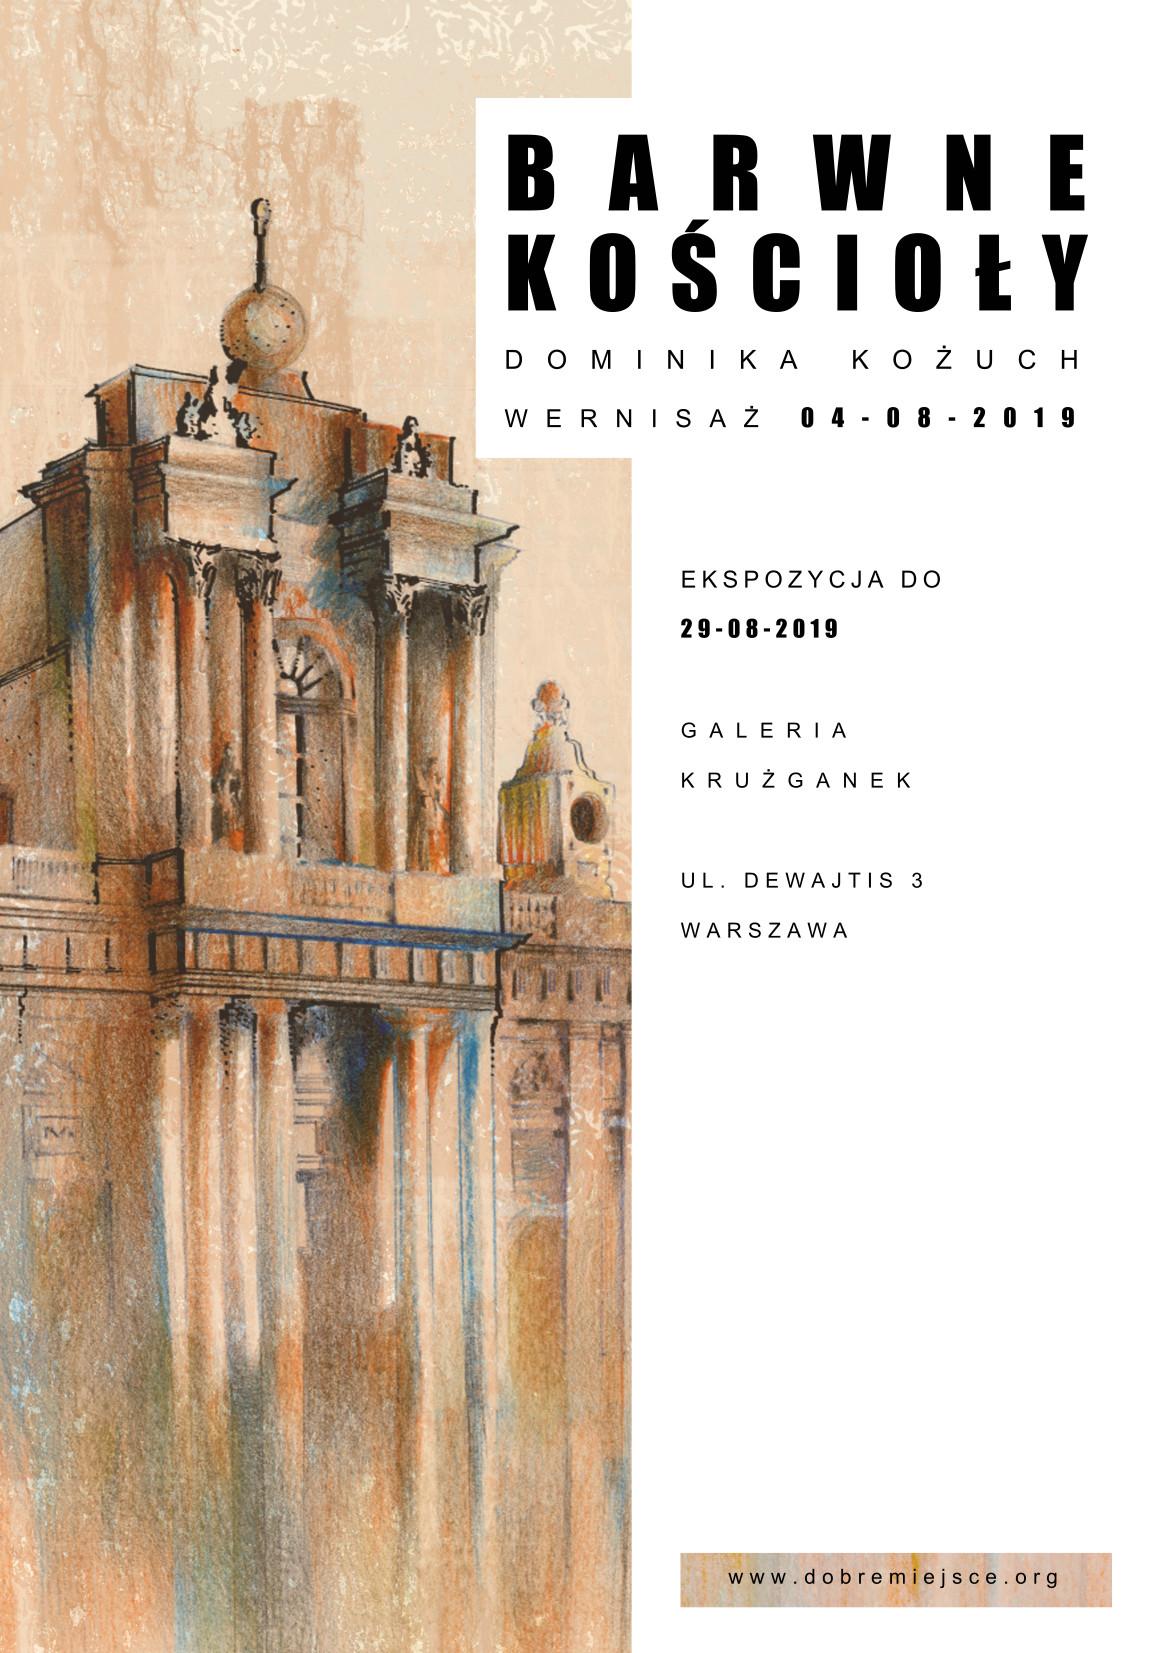 barwne-koscioly-dominika-kozuch-plakat_ver_1